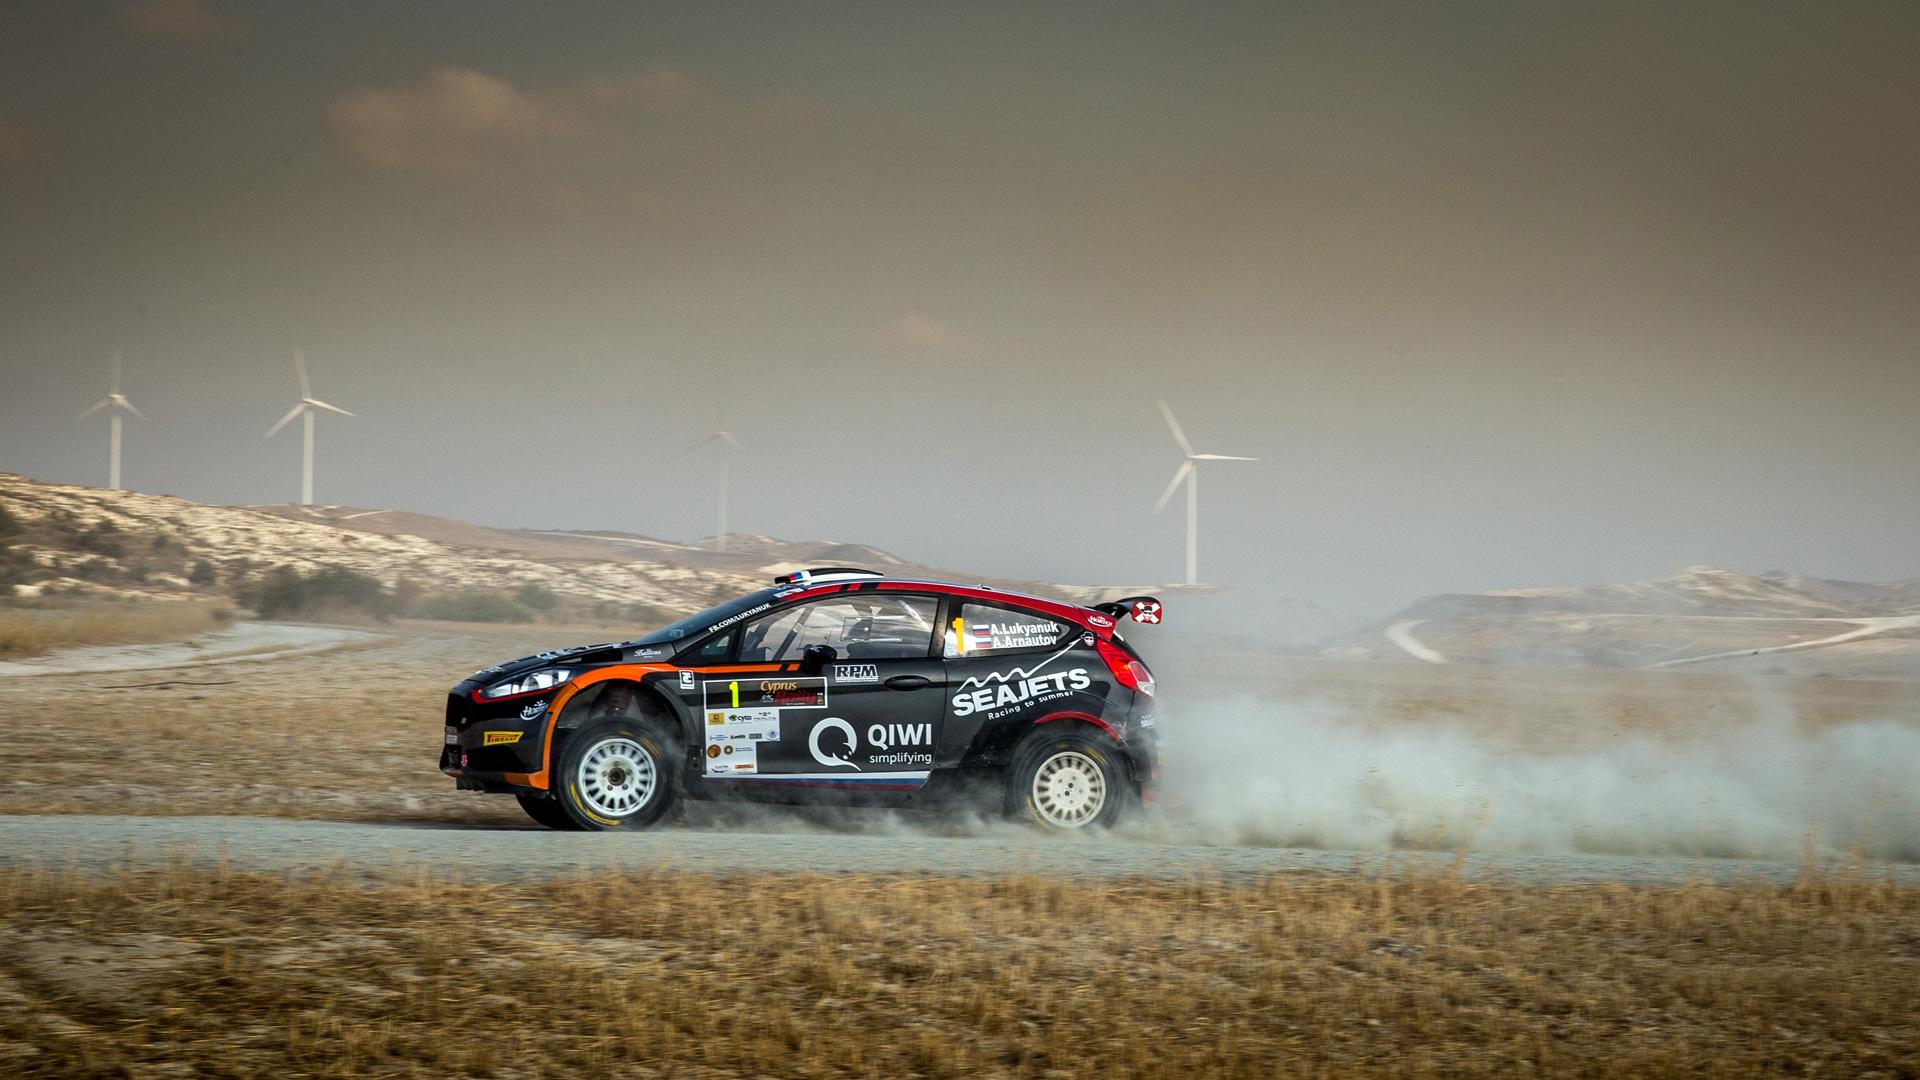 Cyprus Rally 2018 – четвертый этап Чемпионата Европы по ралли